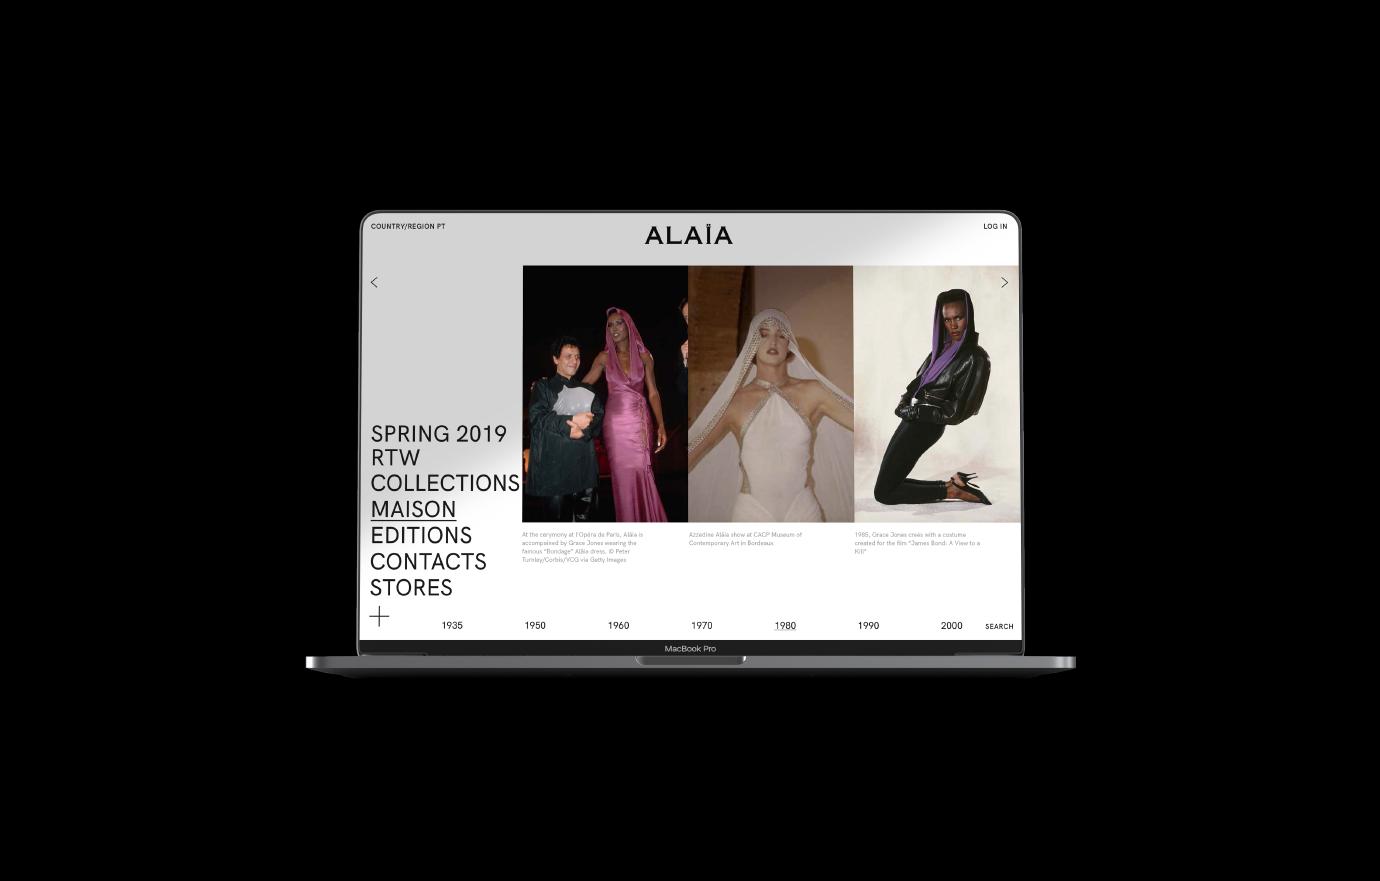 alaia_project_mac_2